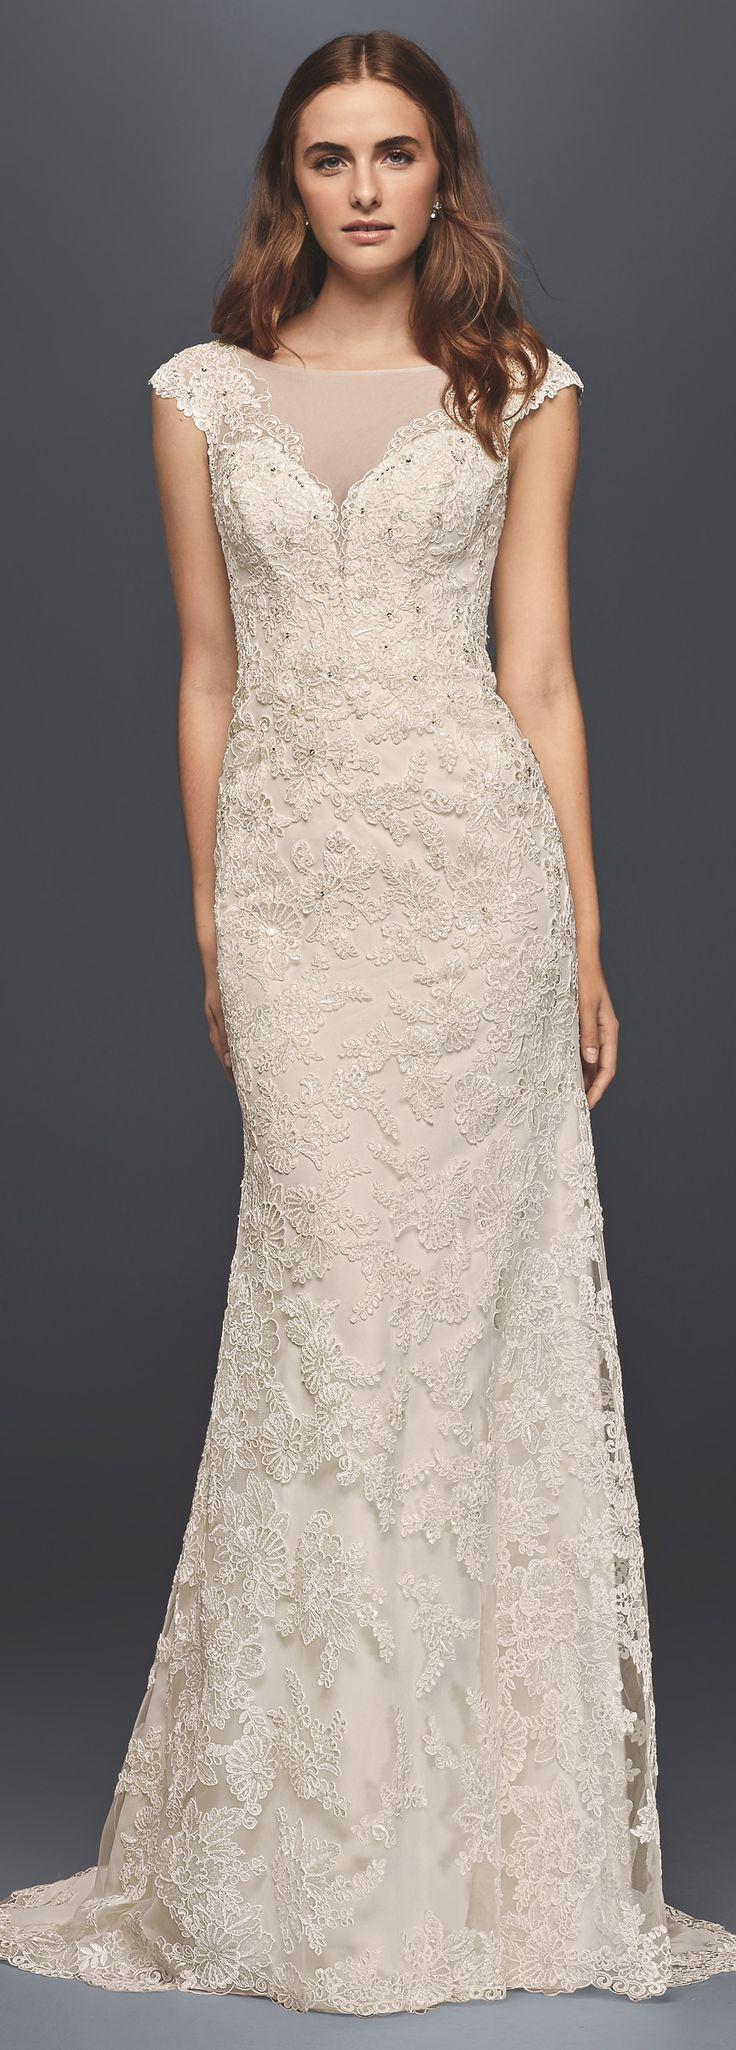 Illusion Lace Sheath Wedding Dress | David's Bridal Spring 2017 | #davidsbridal #ad